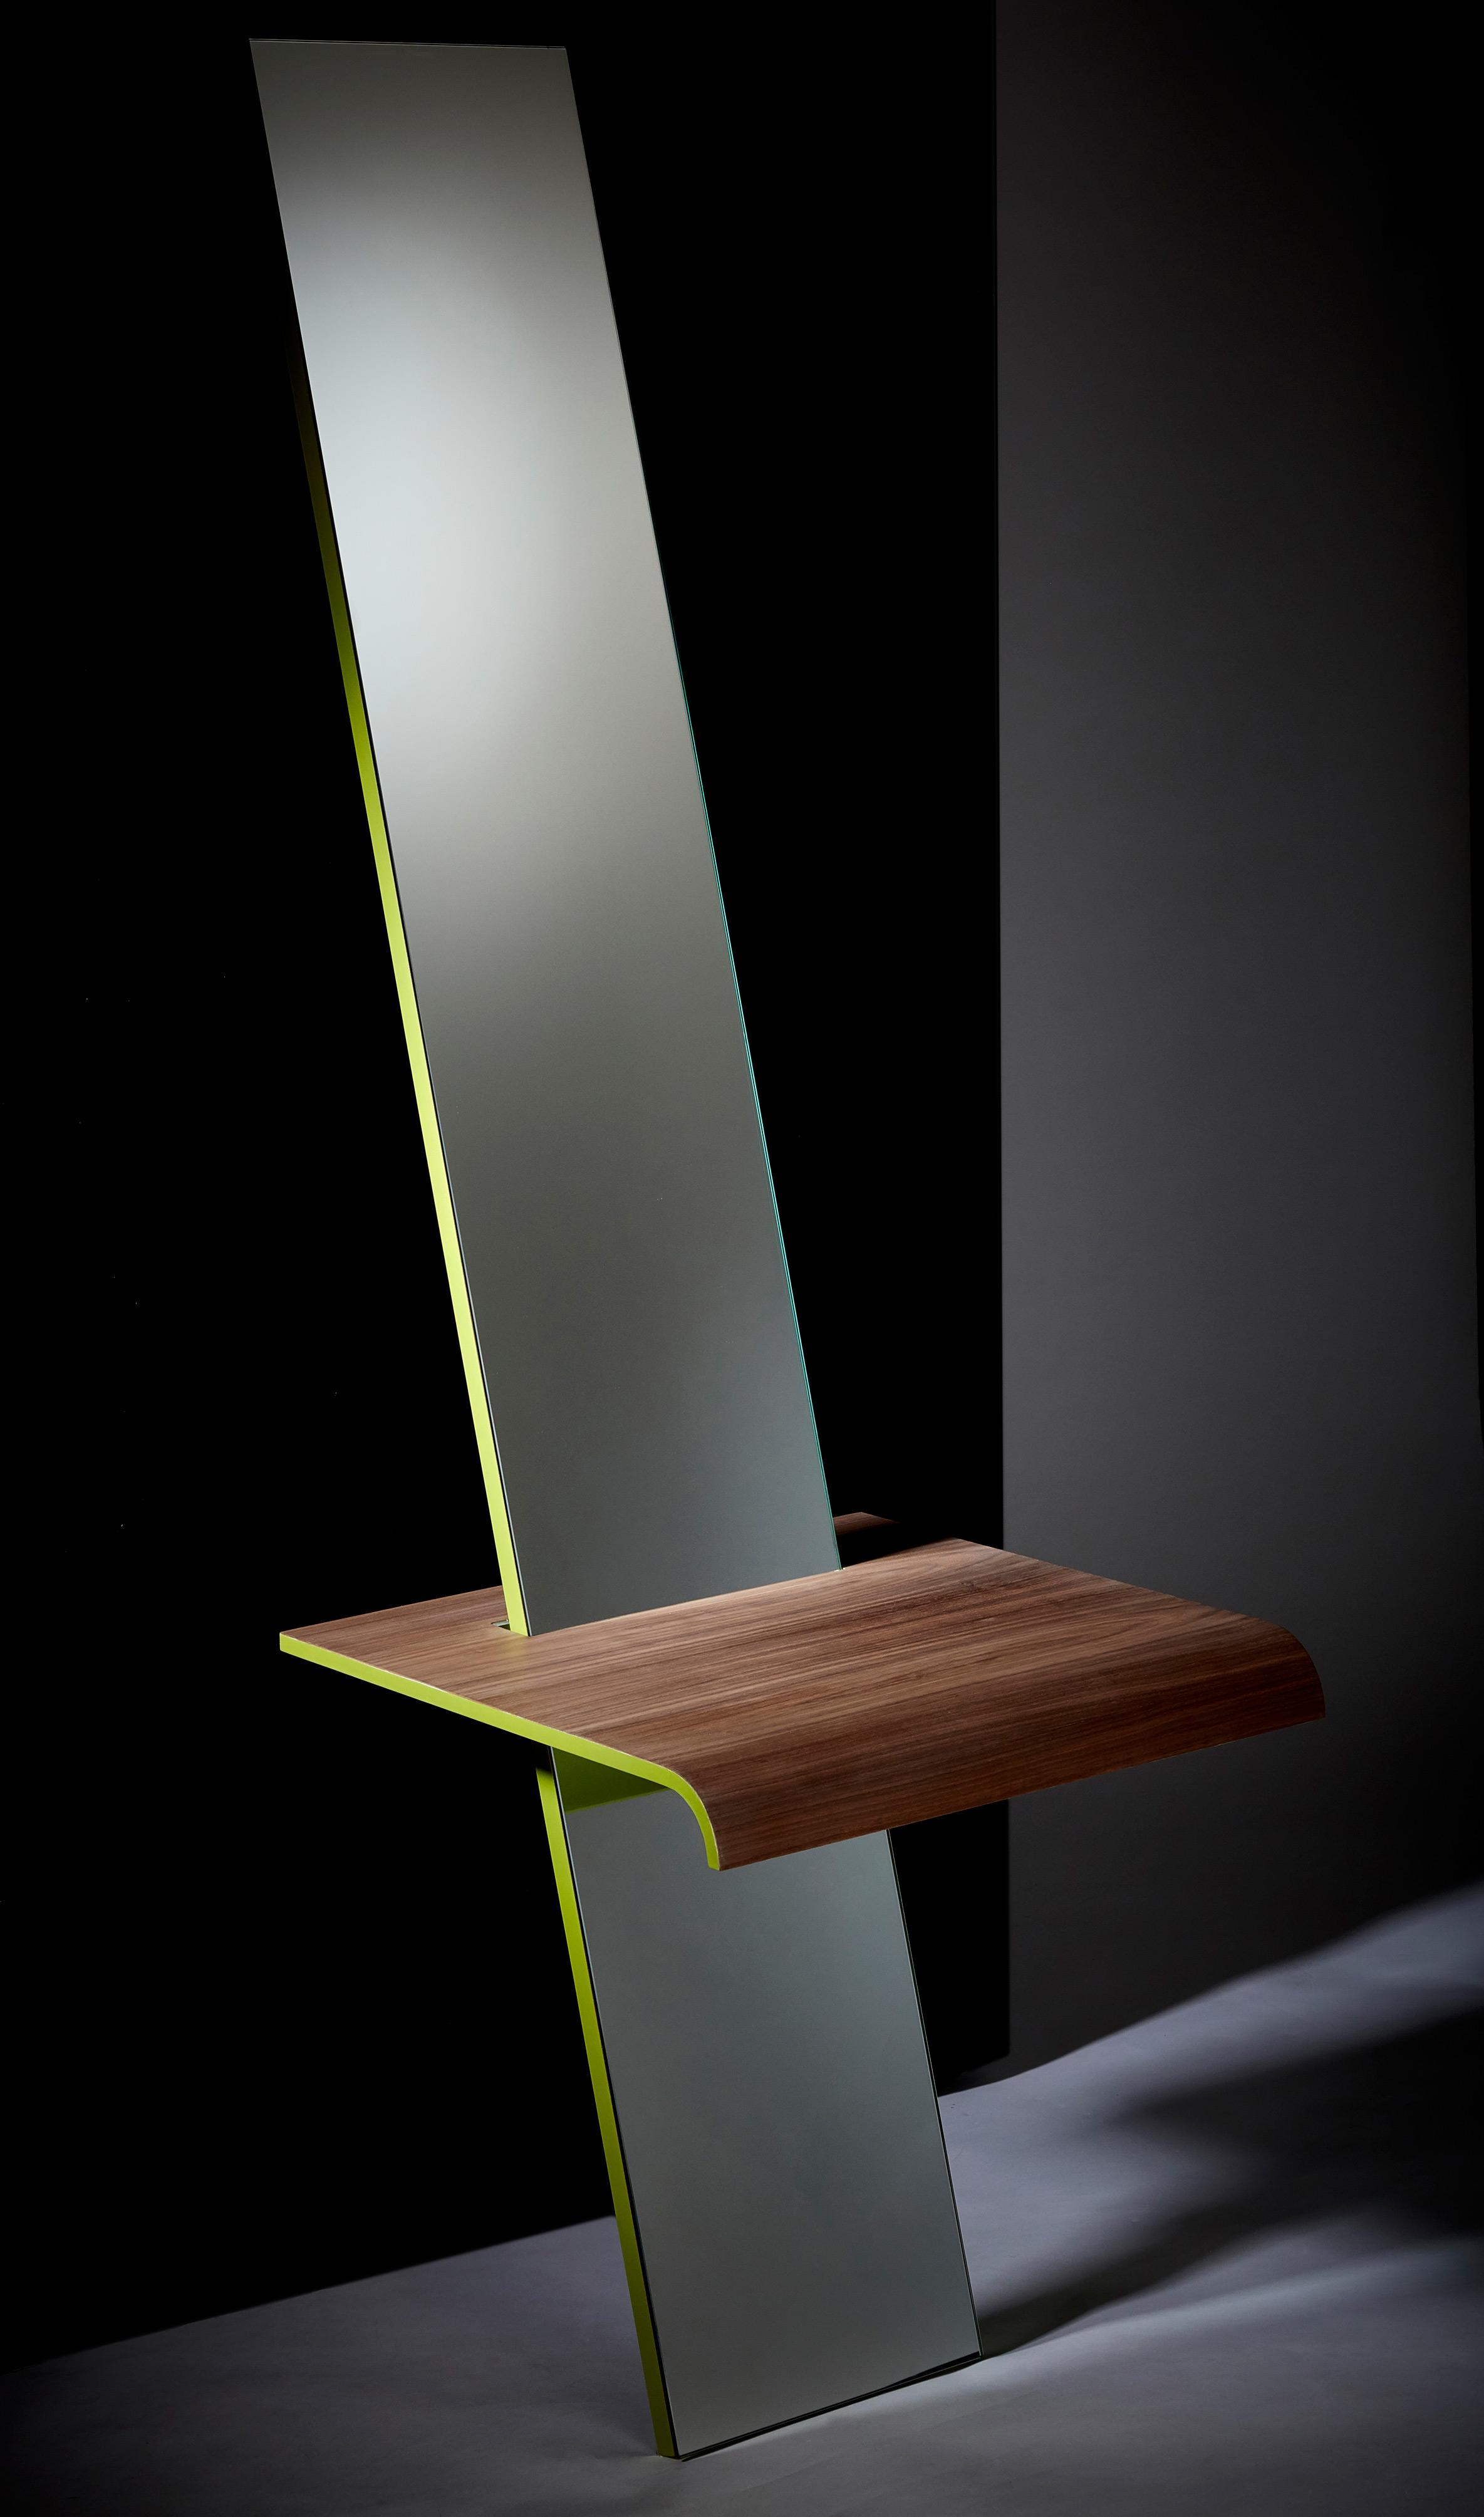 Mirror-product-design-furniture-modern.jpg